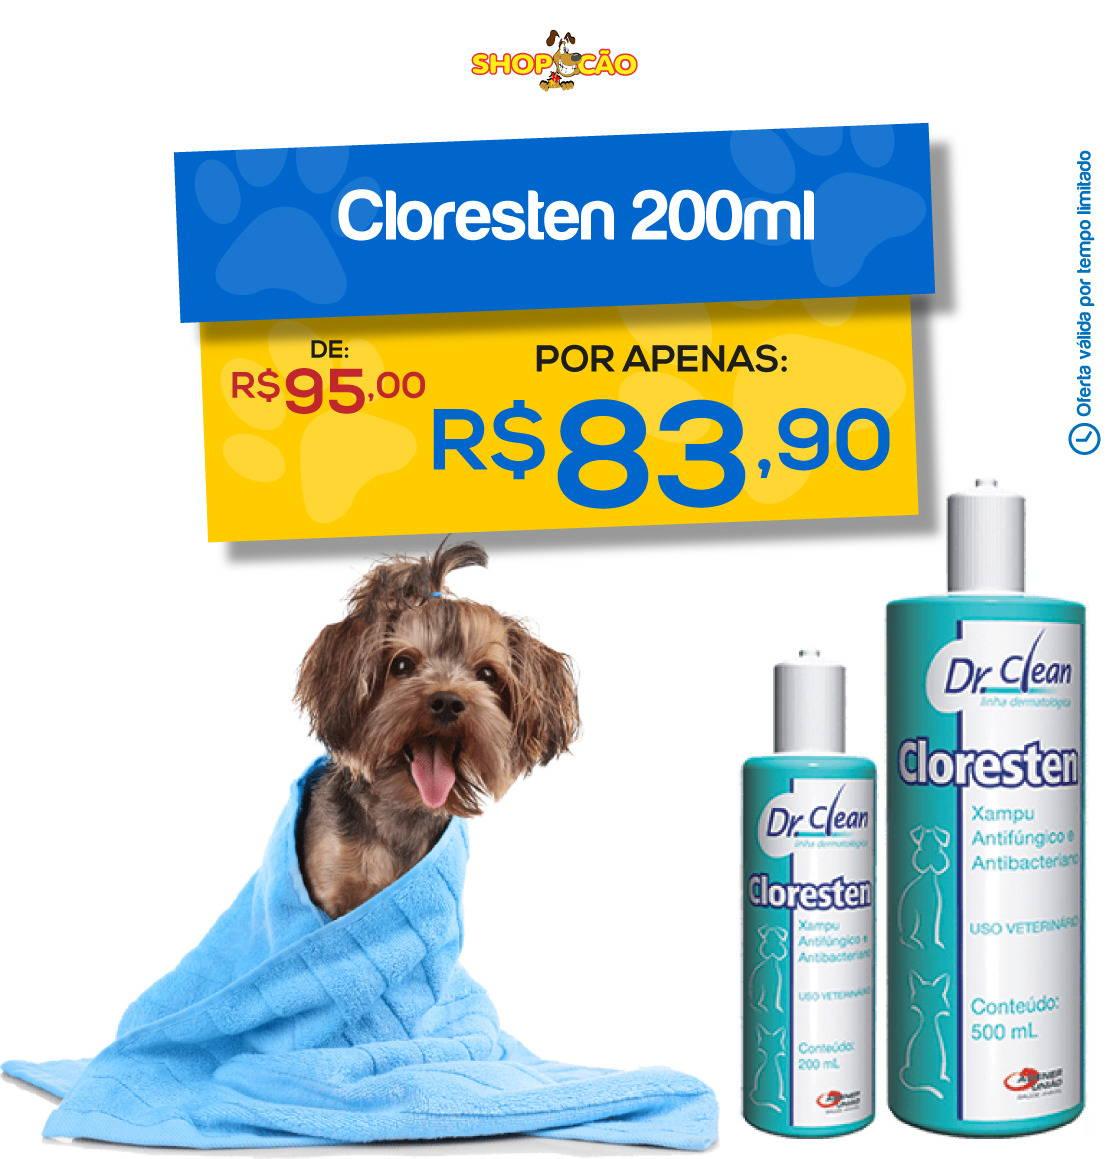 Cloresten Shampoo 200ml